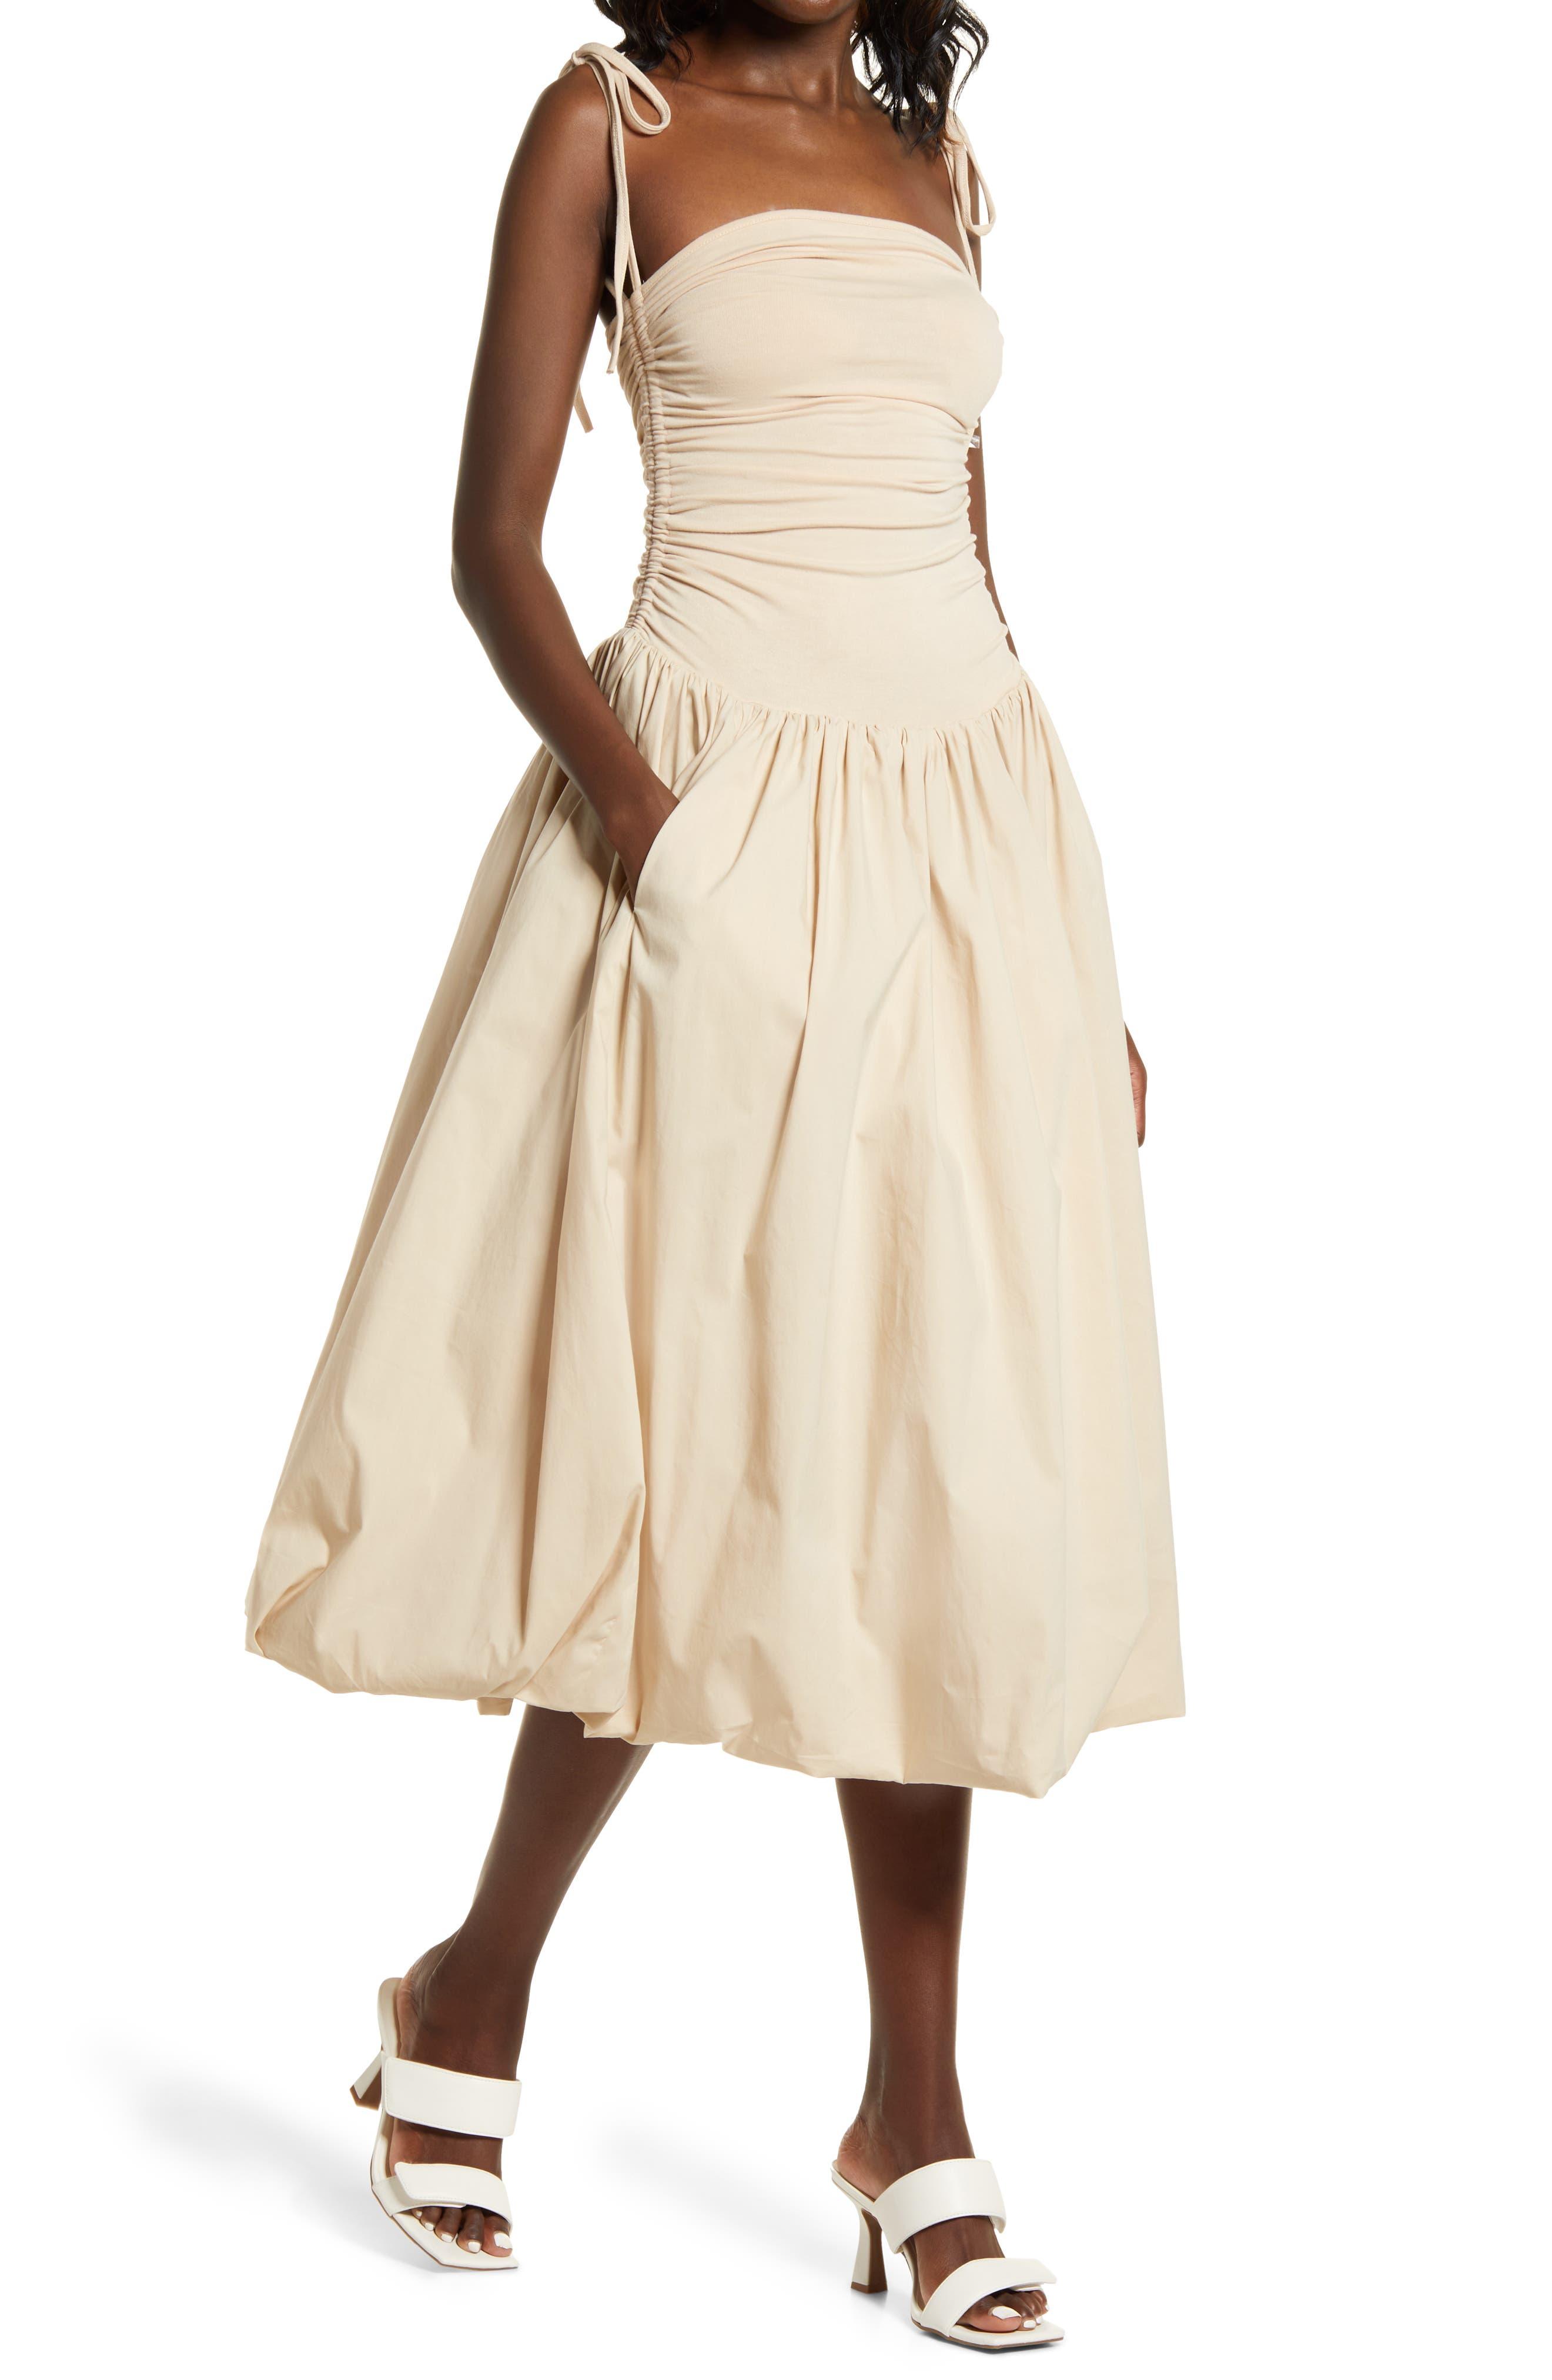 80s Dresses | Casual to Party Dresses Womens Amy Lynn Tie Shoulder Midi Dress Size Large - Beige $112.00 AT vintagedancer.com